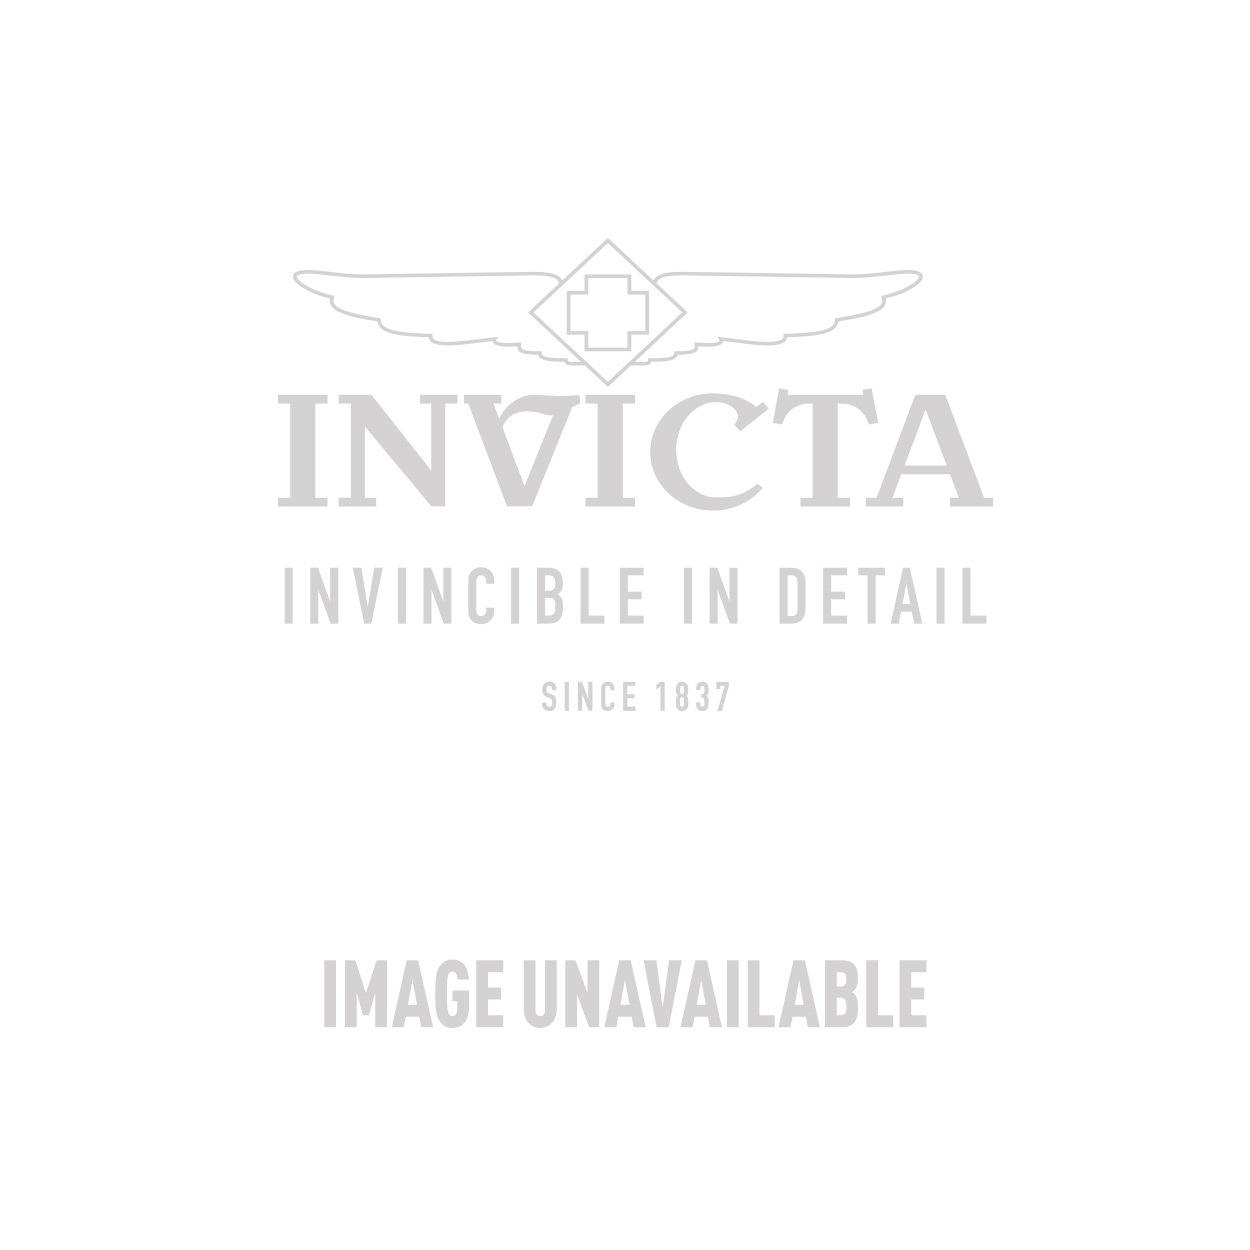 Invicta Excursion Swiss Made Quartz Watch - Black, Green, Titanium case with Black tone Silicone band - Model 18563